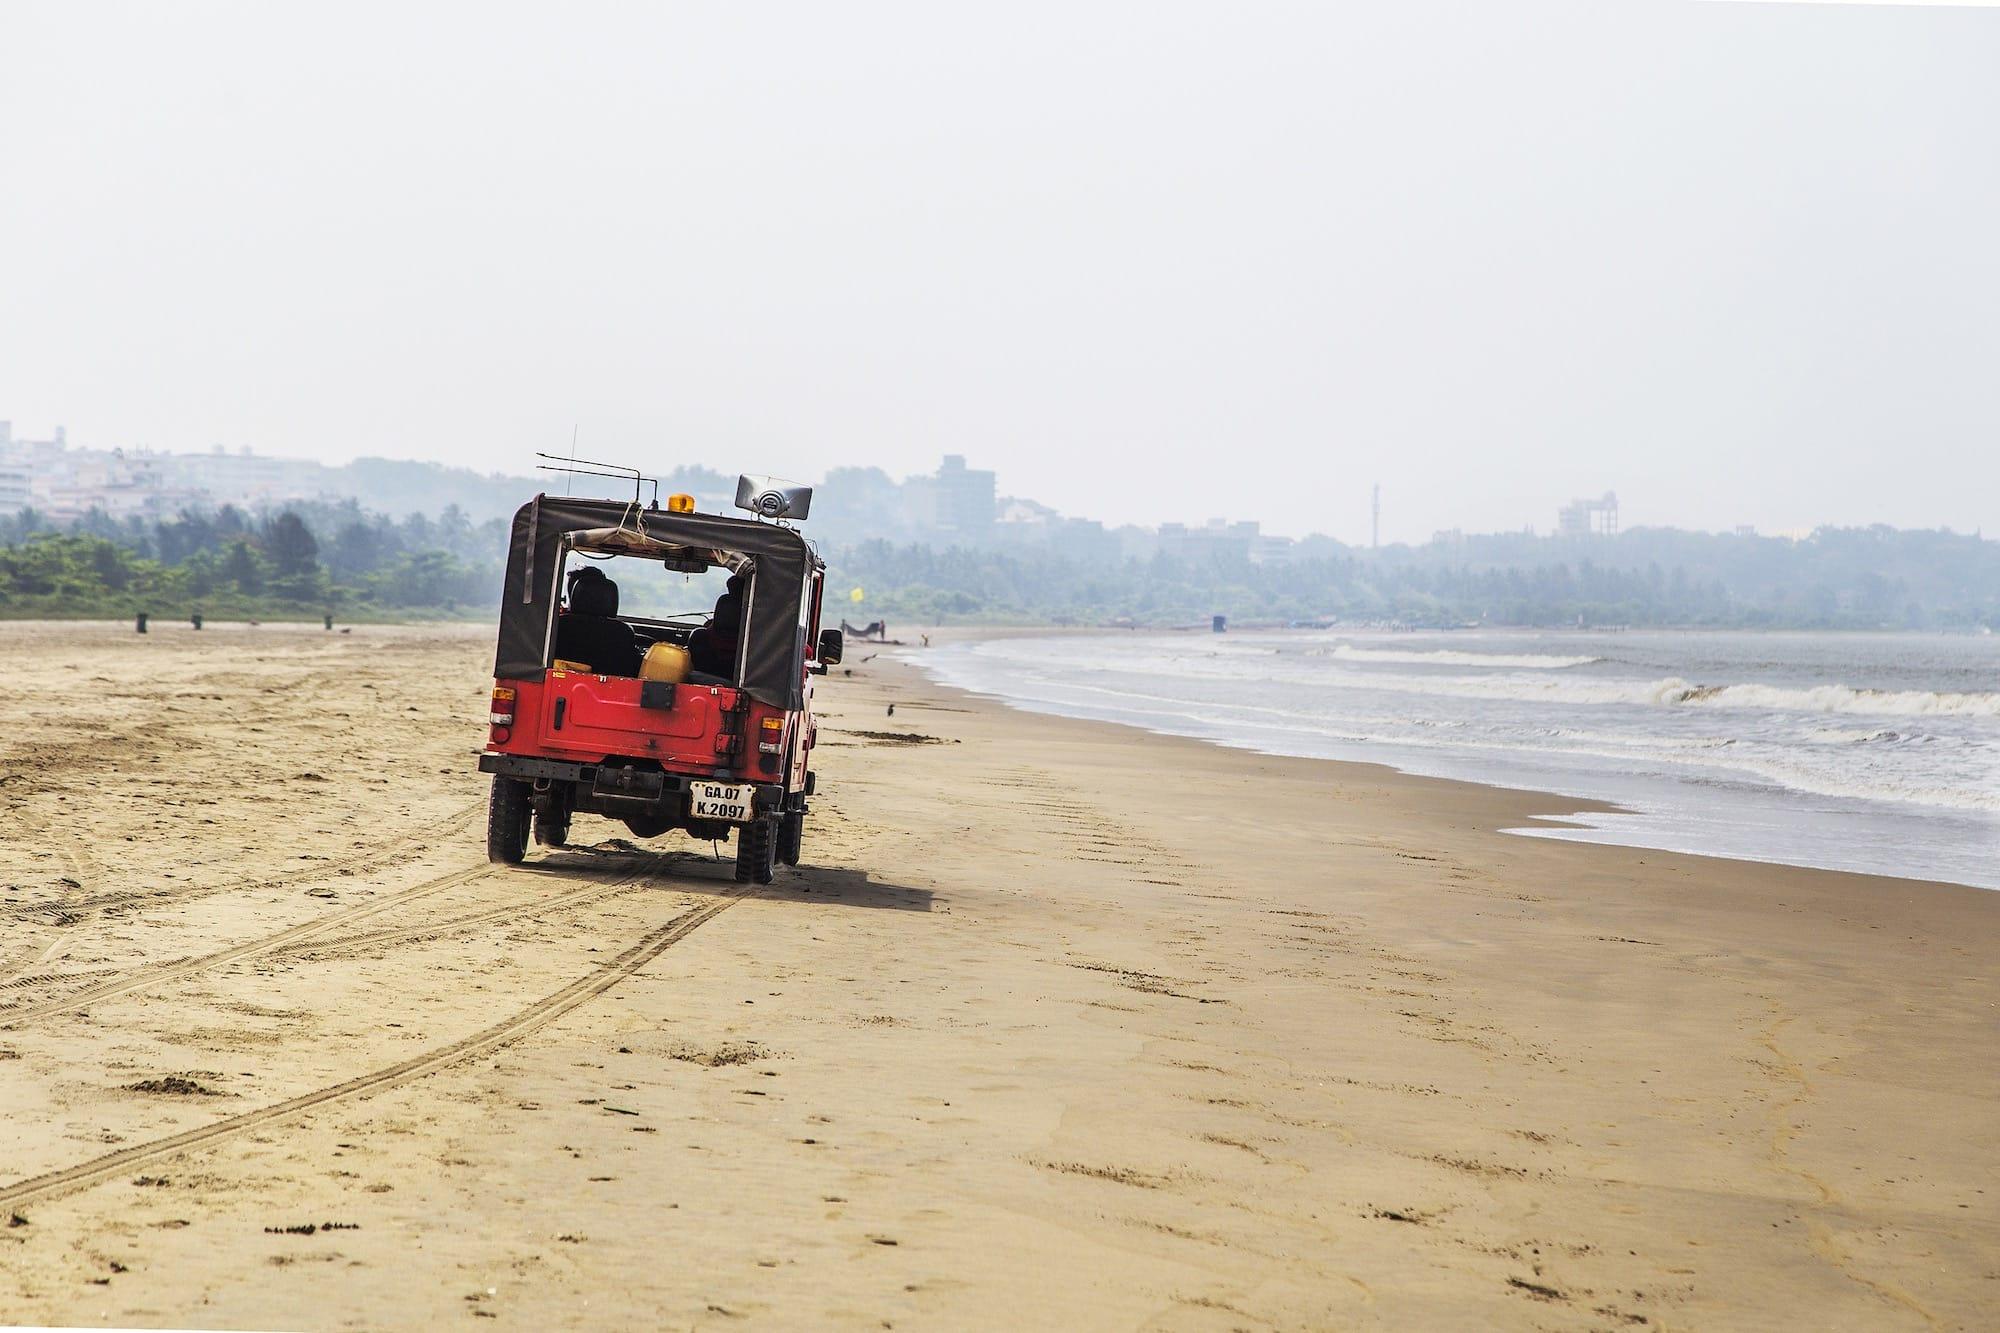 Jeden-dzien-na-Goa-7-hero